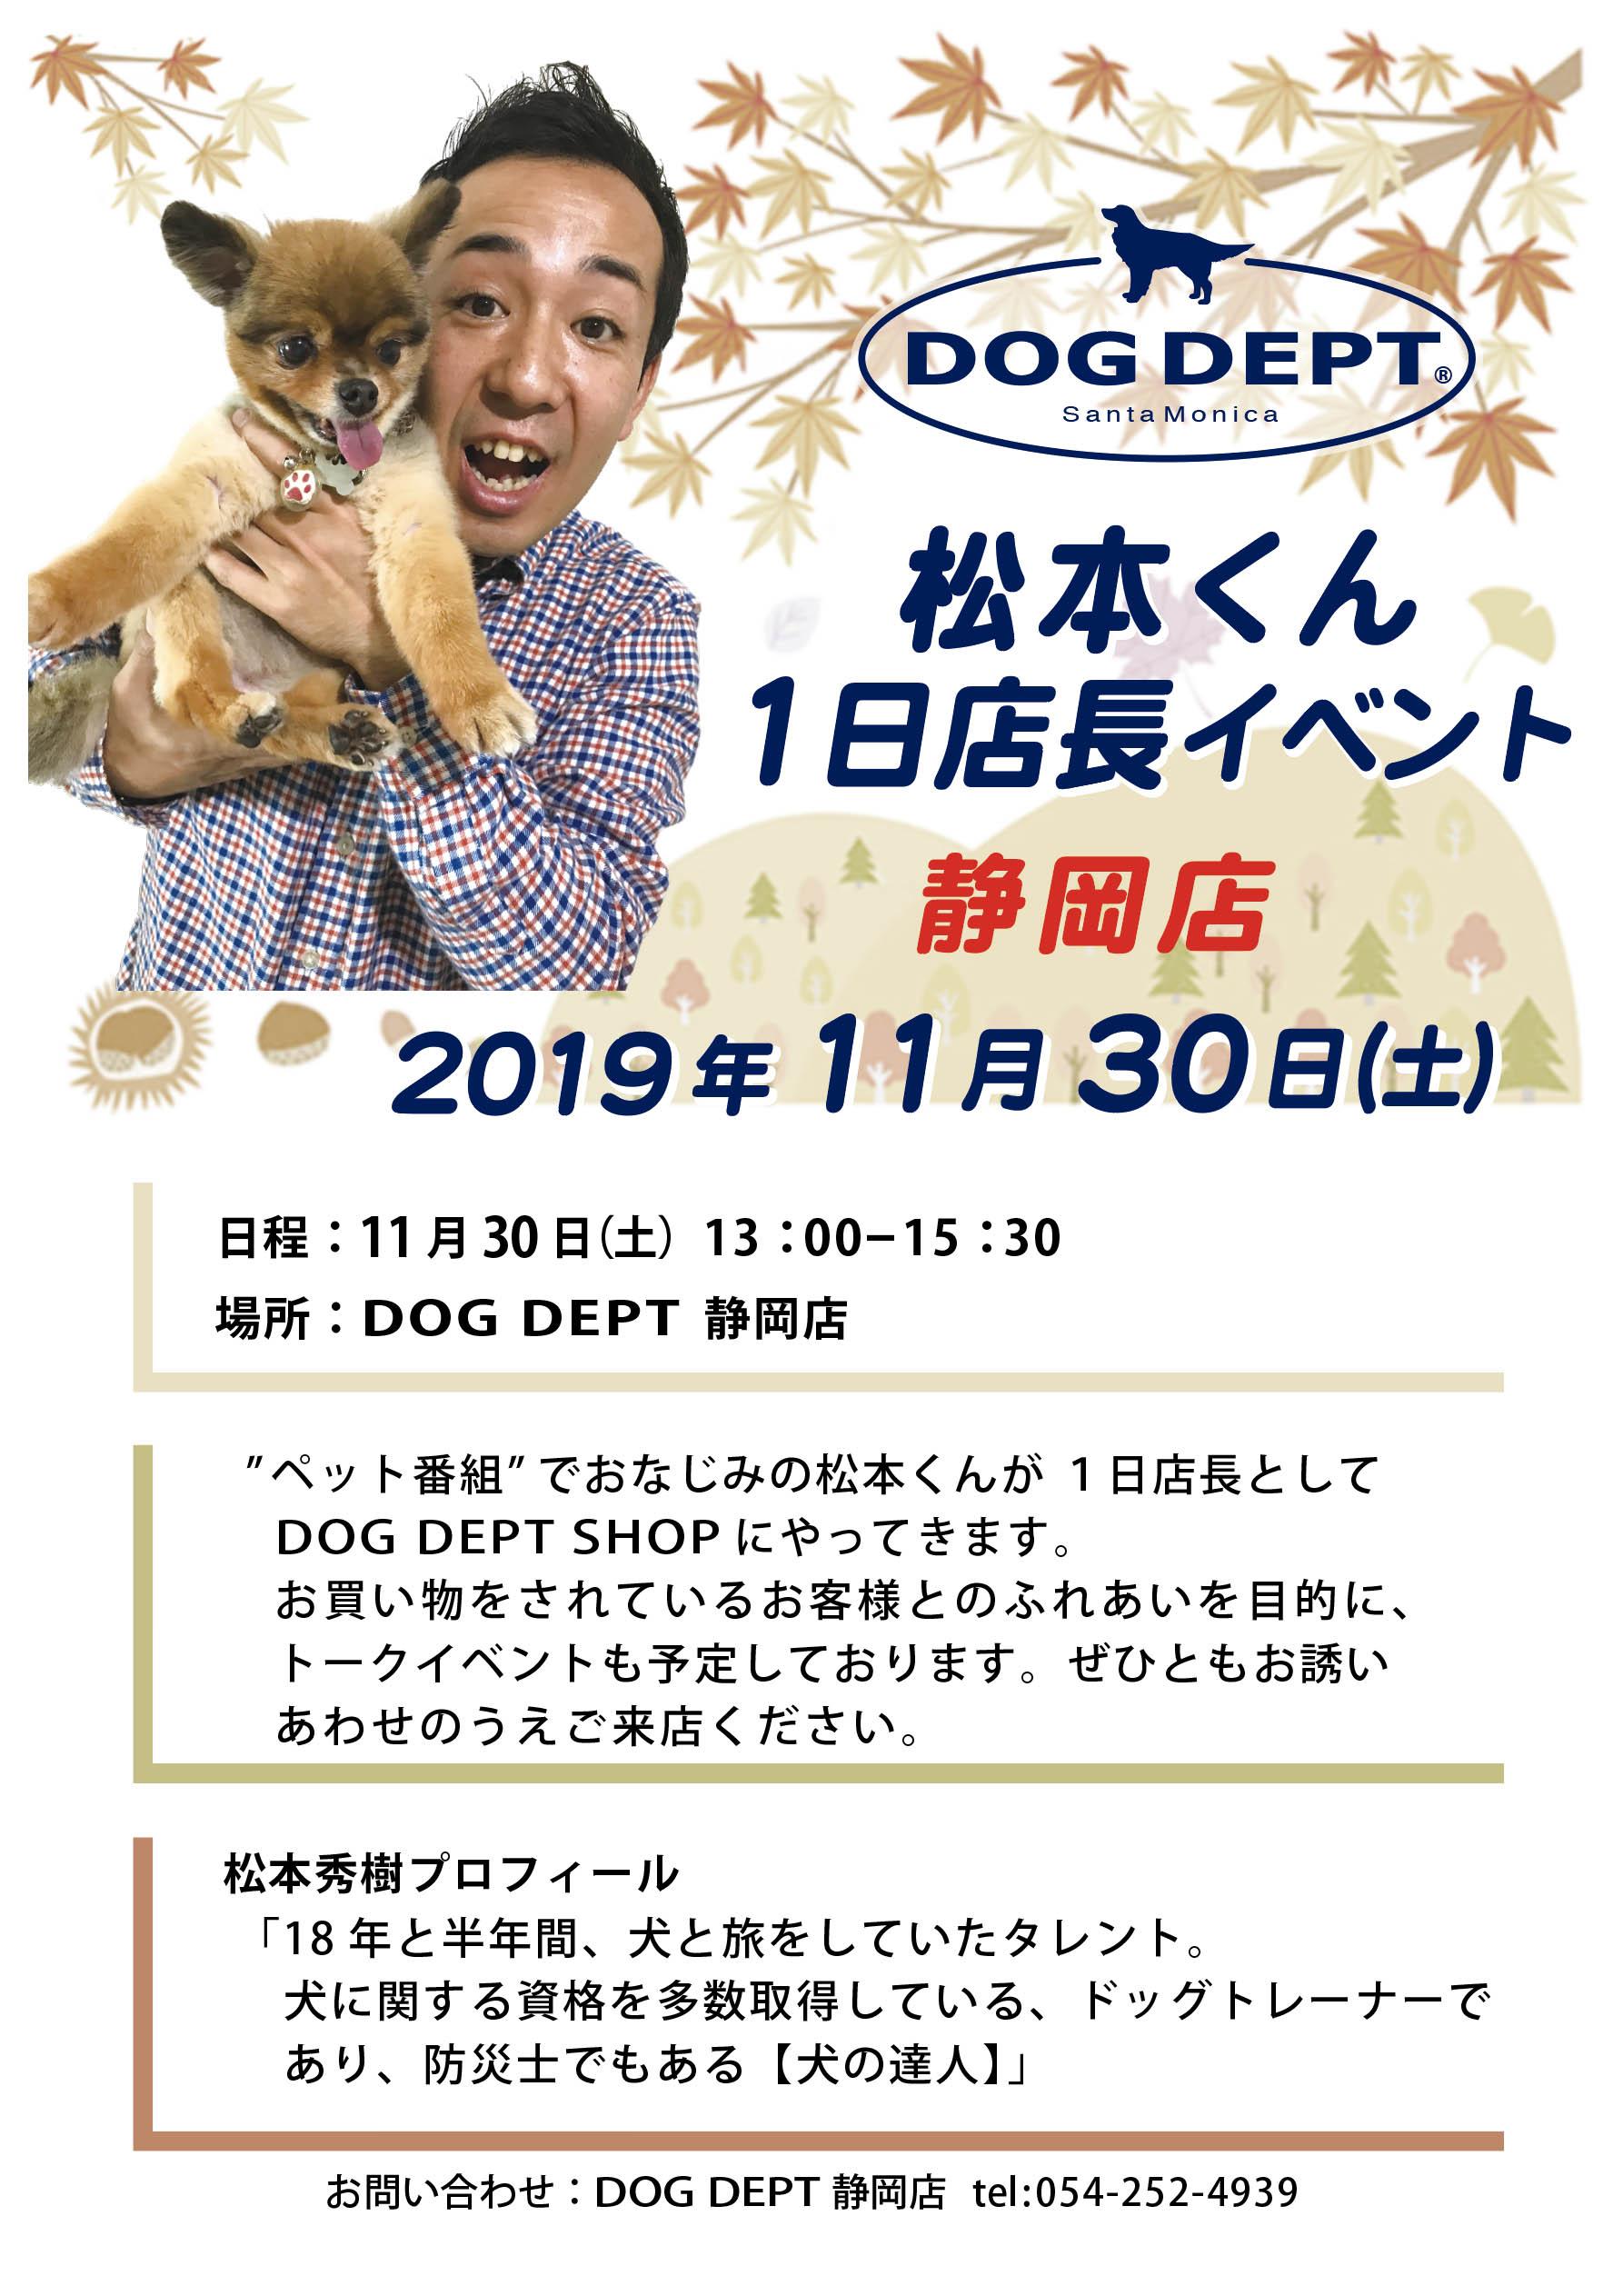 20191105_shizuoka